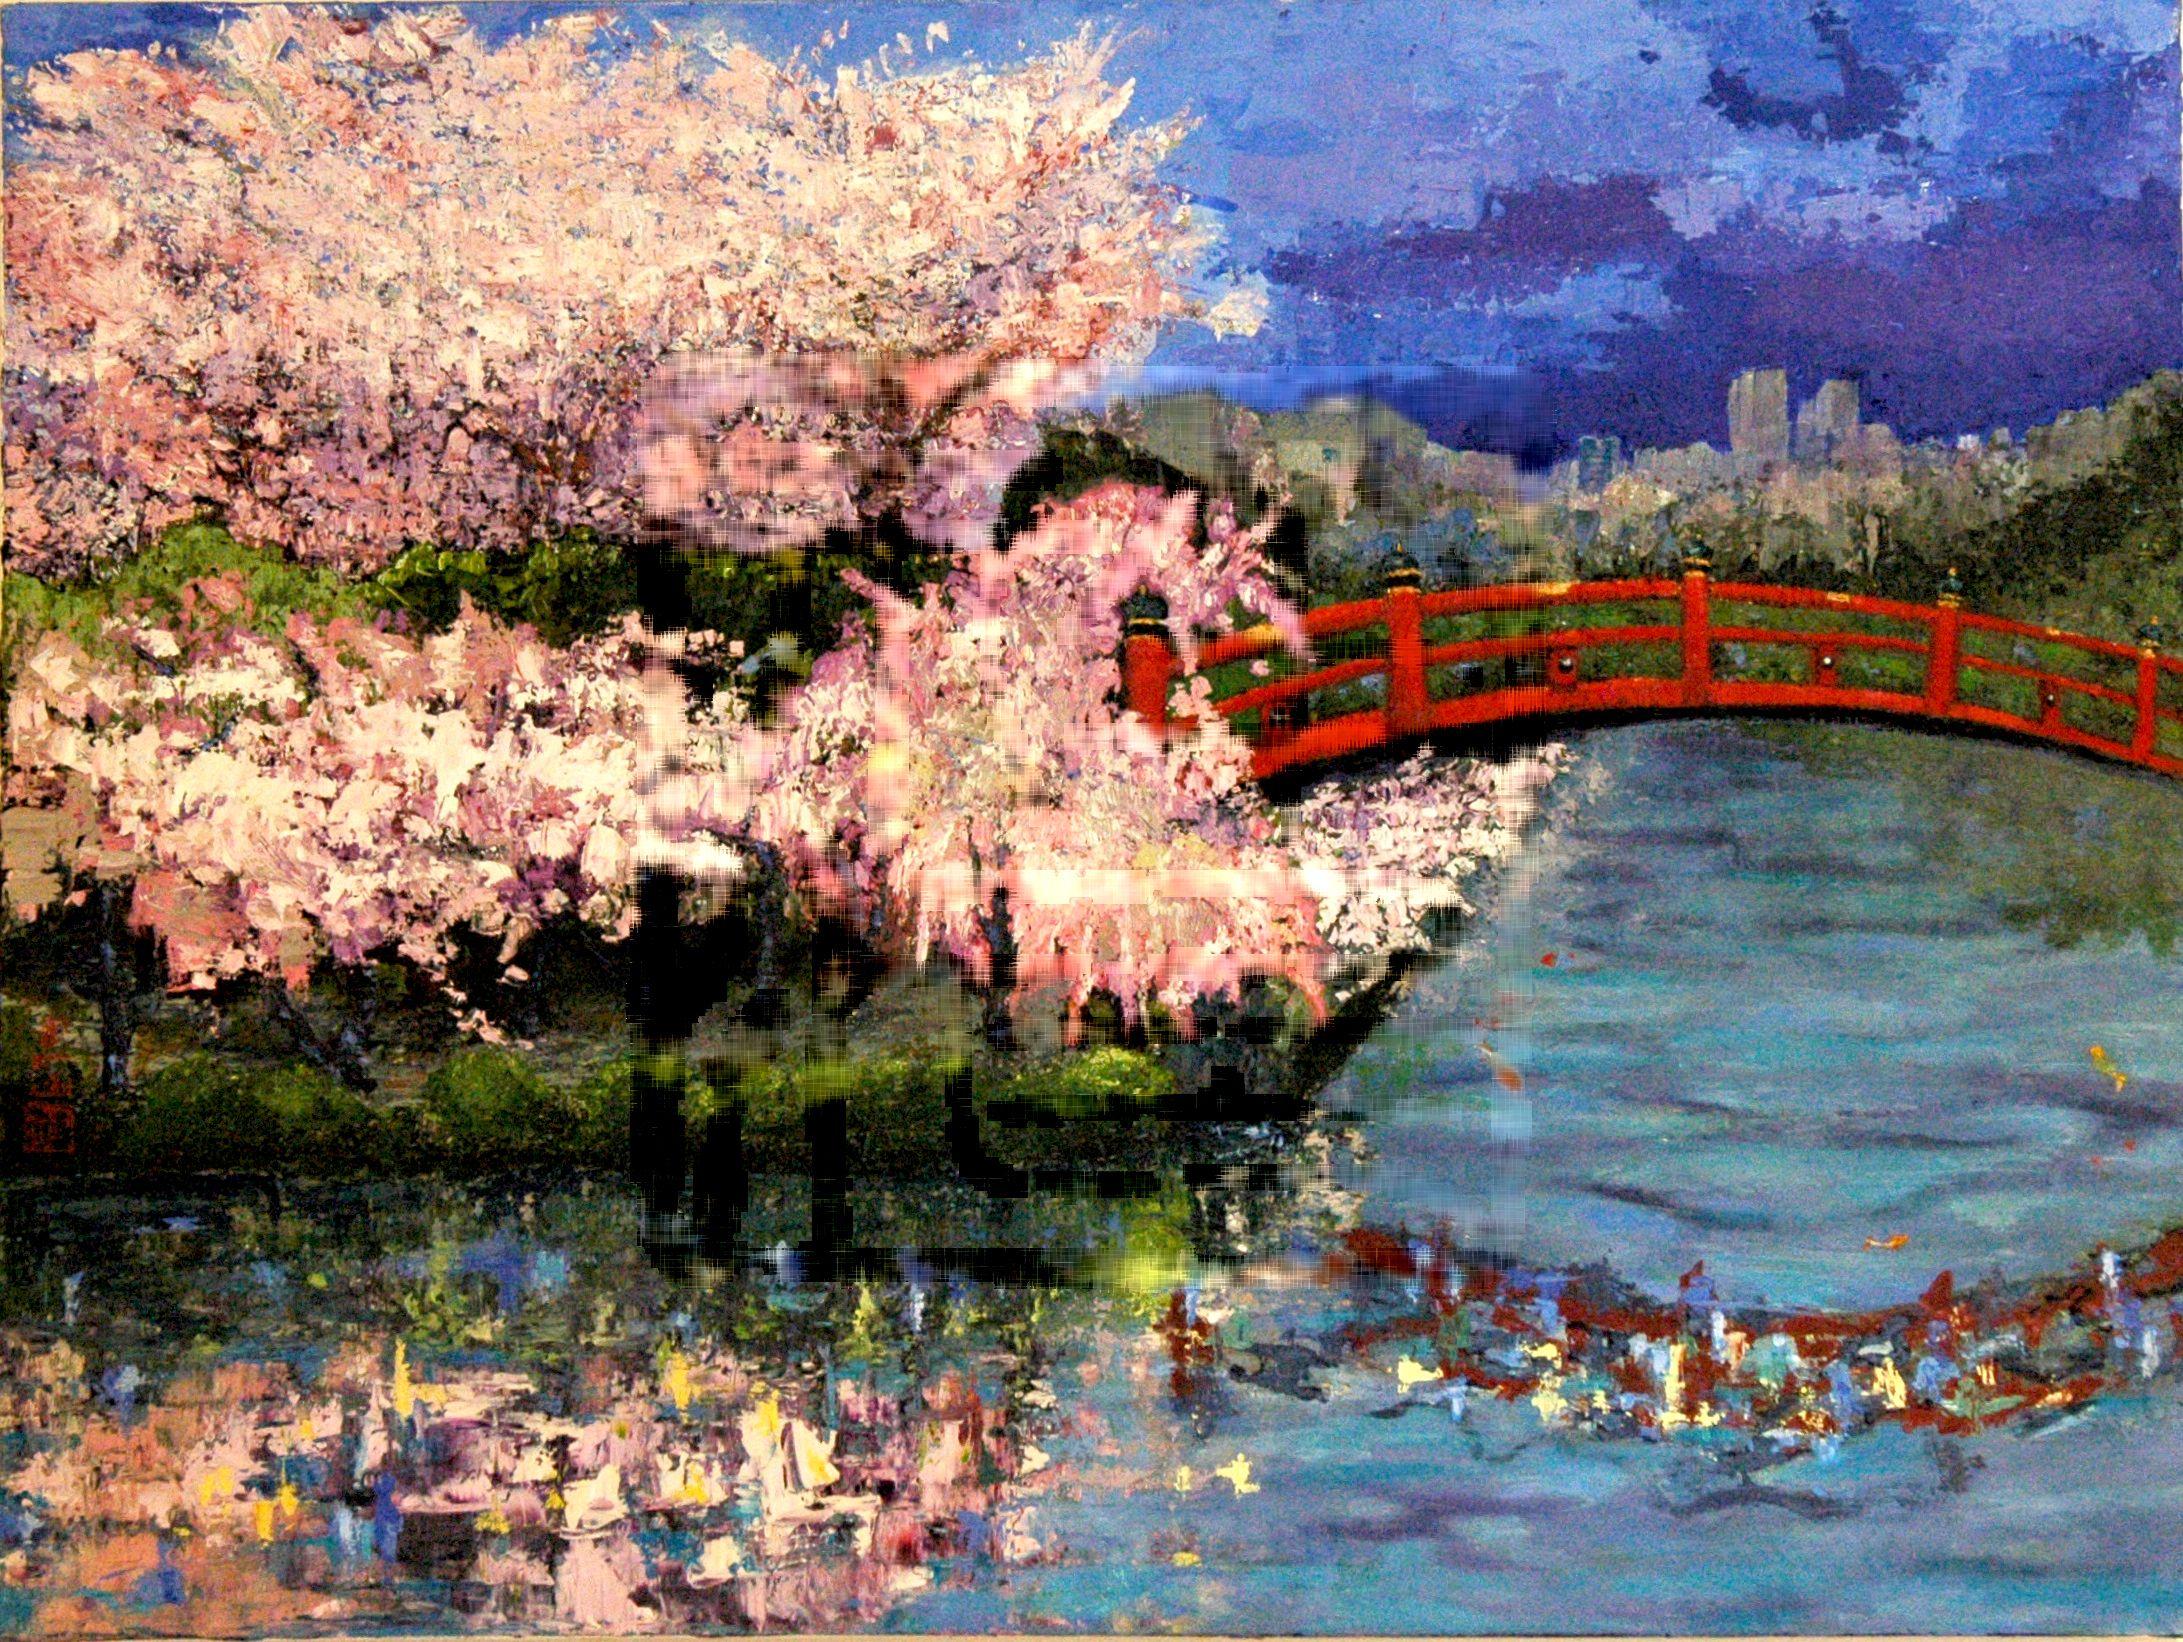 pin japanese garden art landscape wallpaper 1680x1050 on pinterest 2183x1642 in 36588